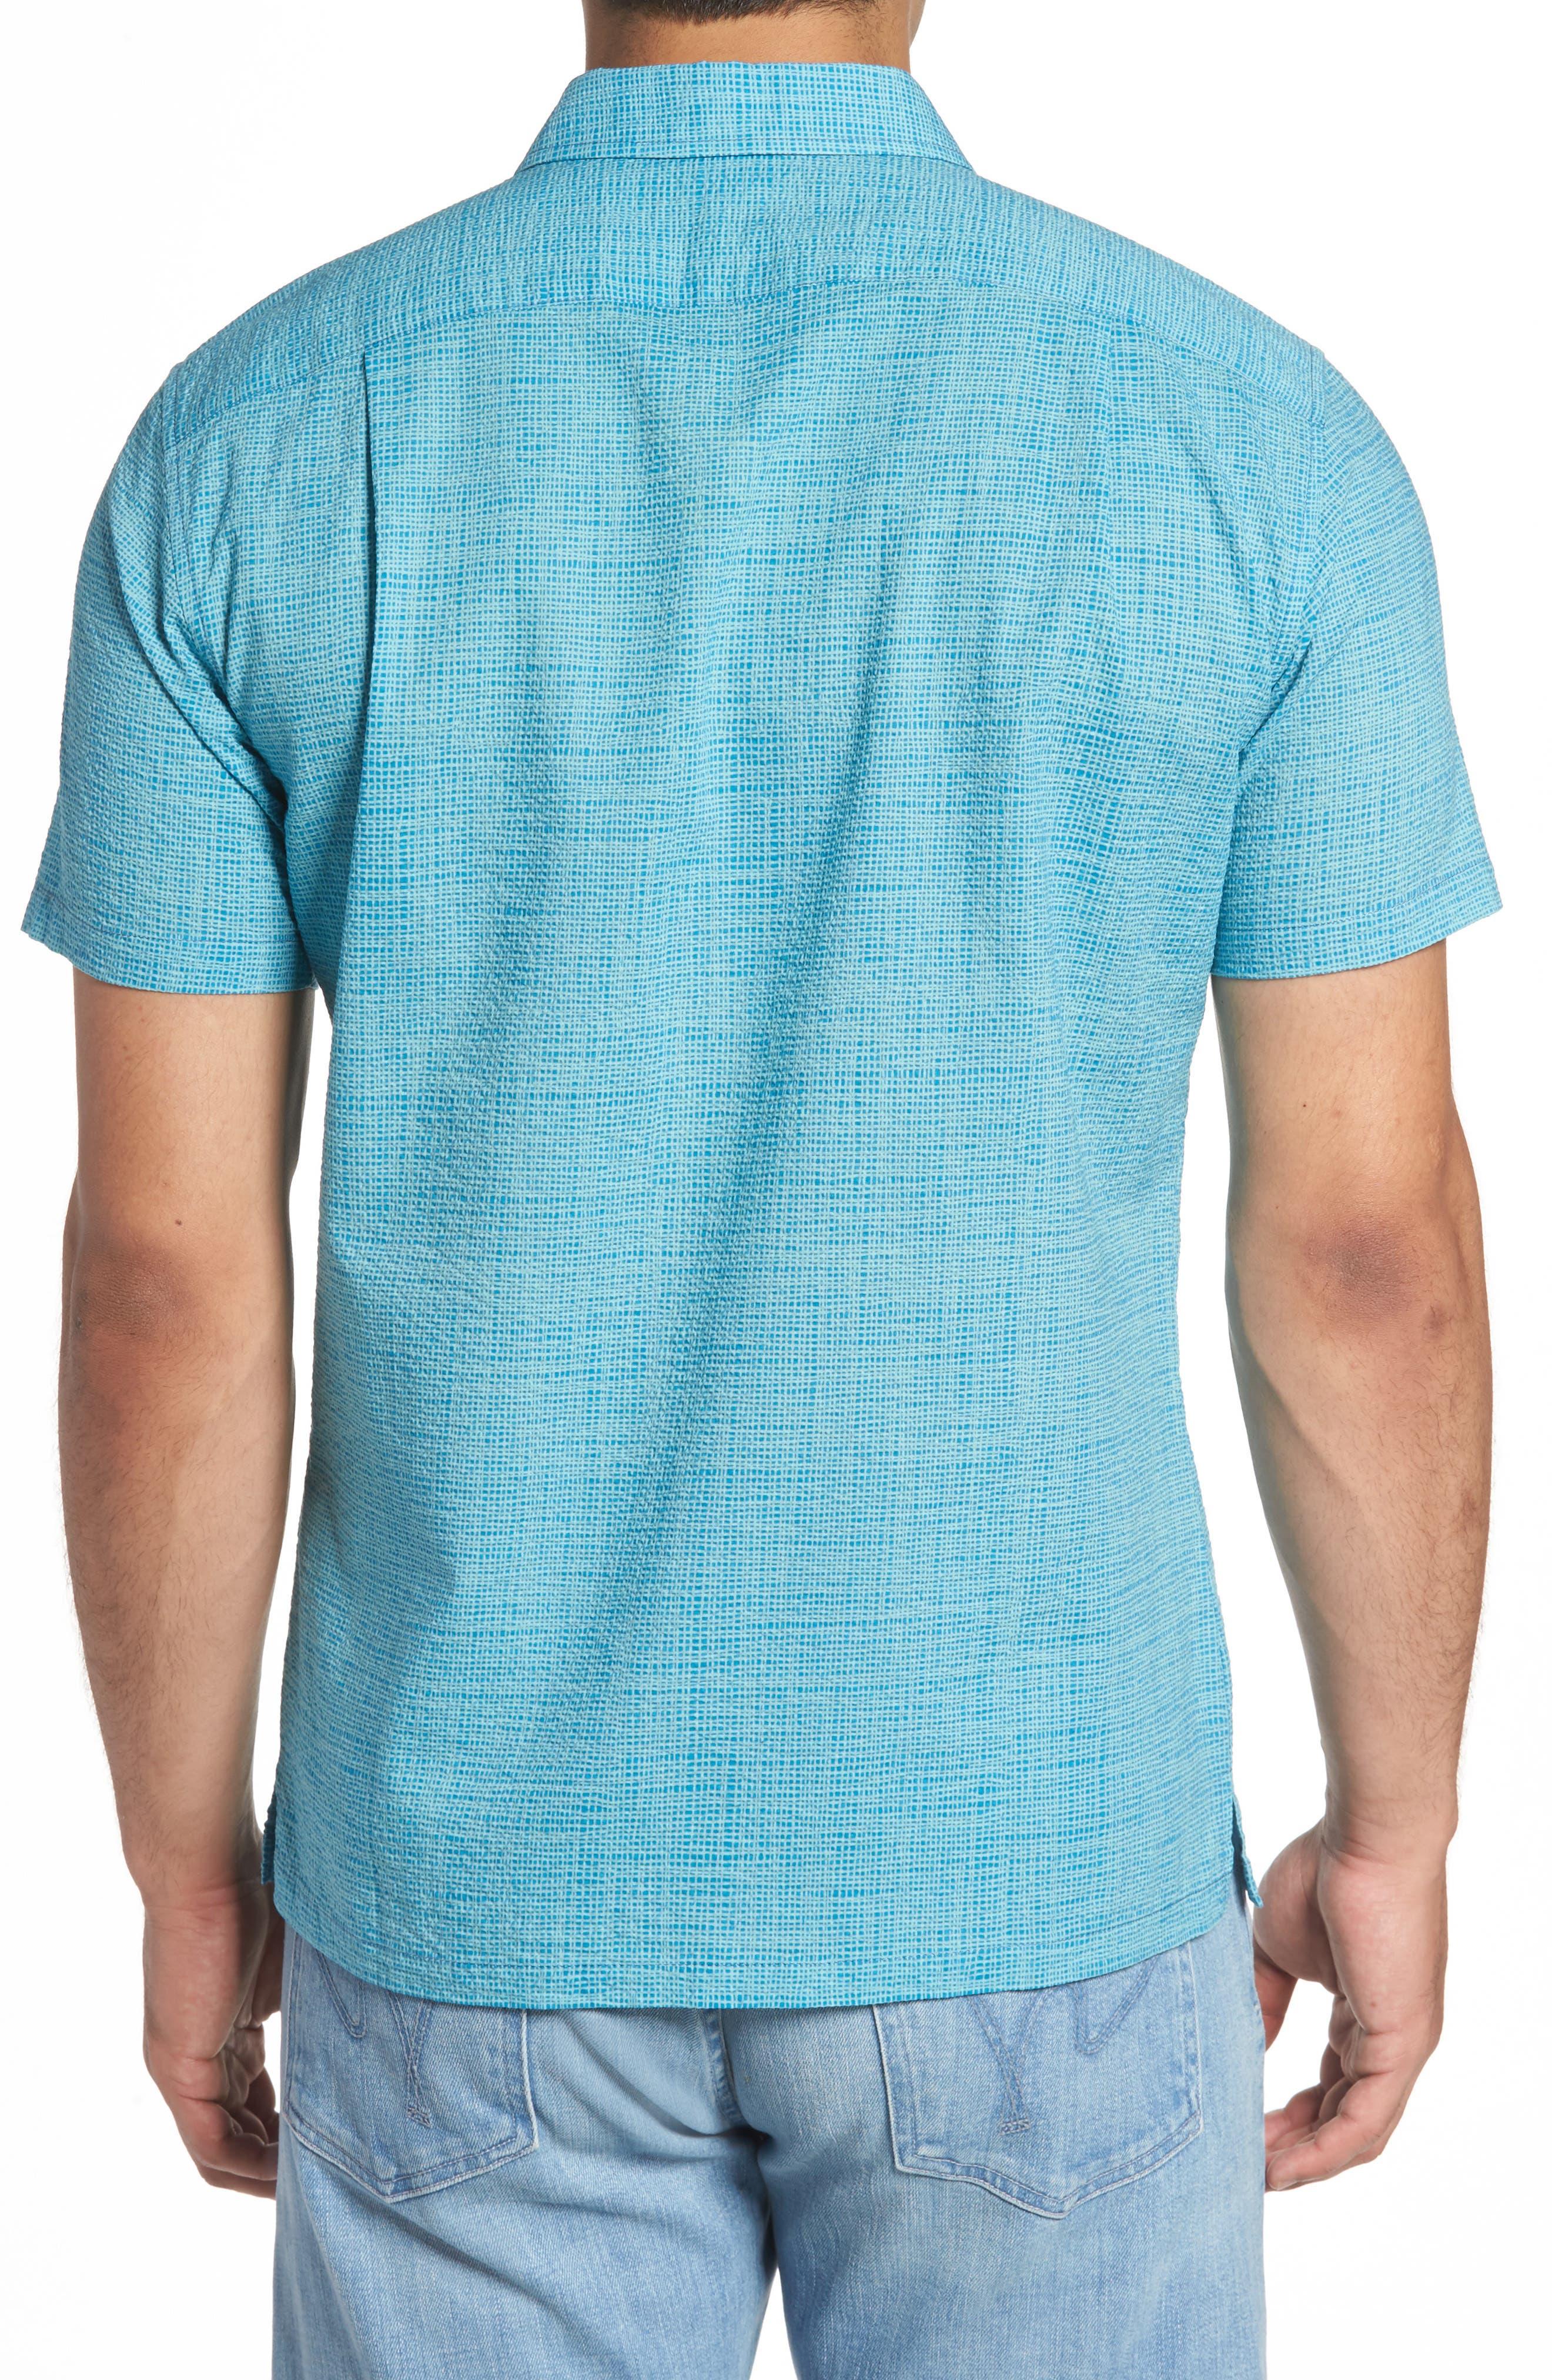 Alternate Image 2  - Tori Richard Net Worth Slim Fit Camp Shirt